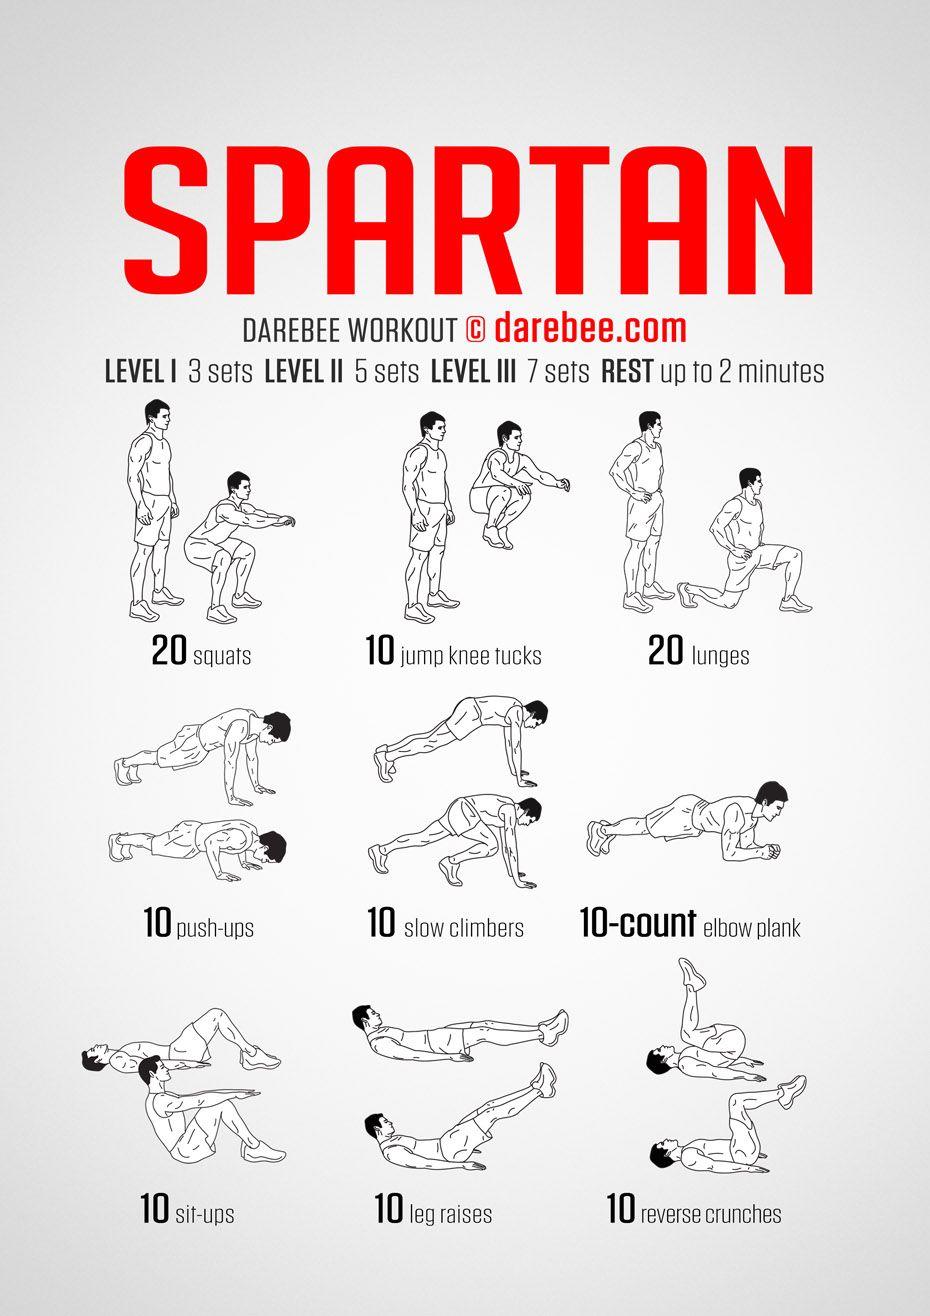 Spartan Workout | Spartan workout, Darebee, Workout